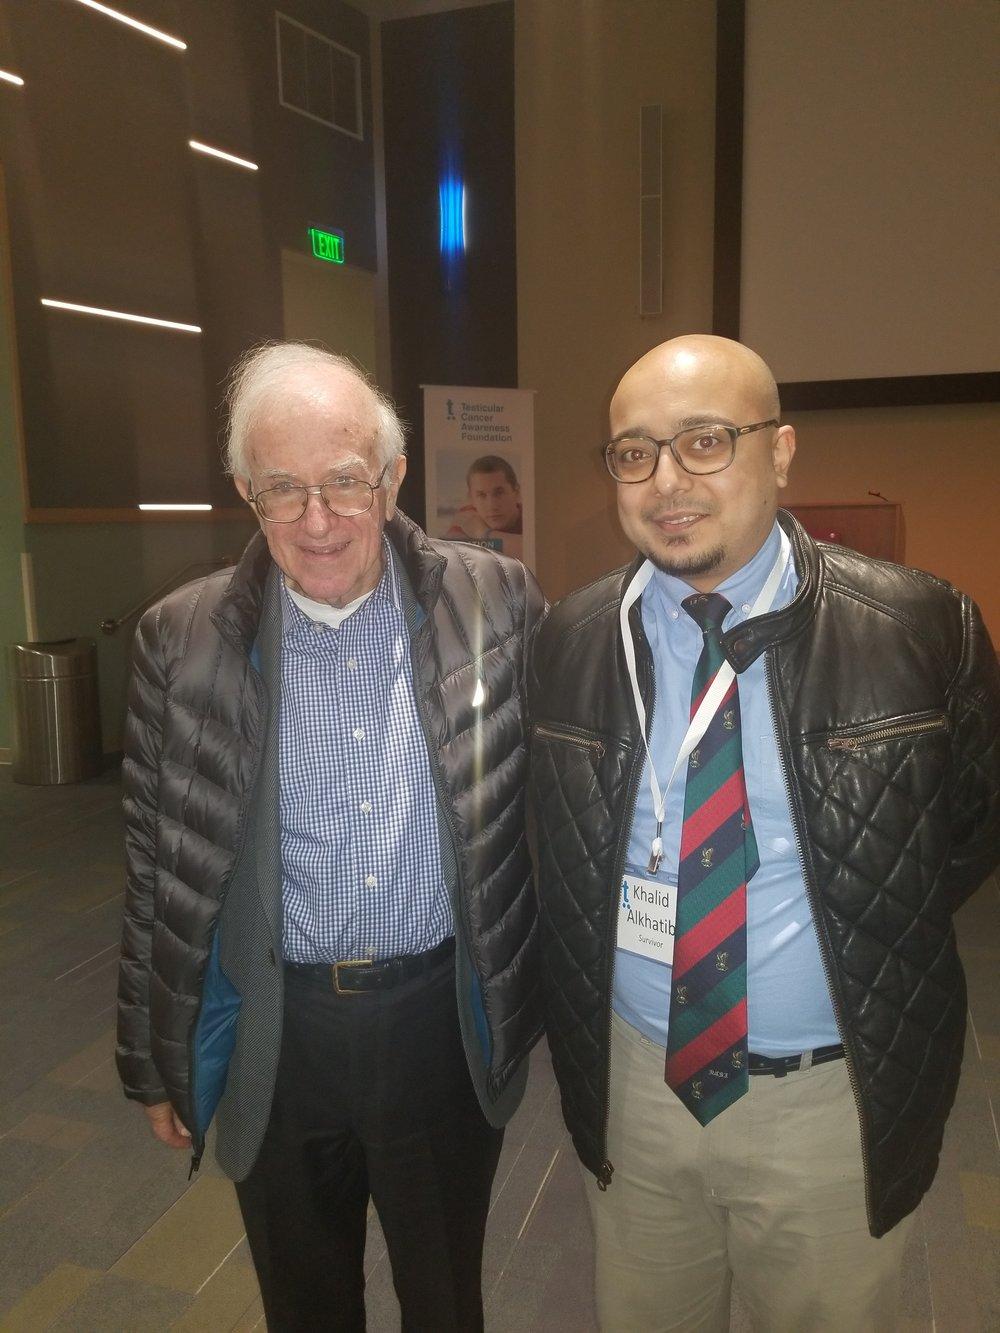 Dr. Einhorn & Khalid.jpg